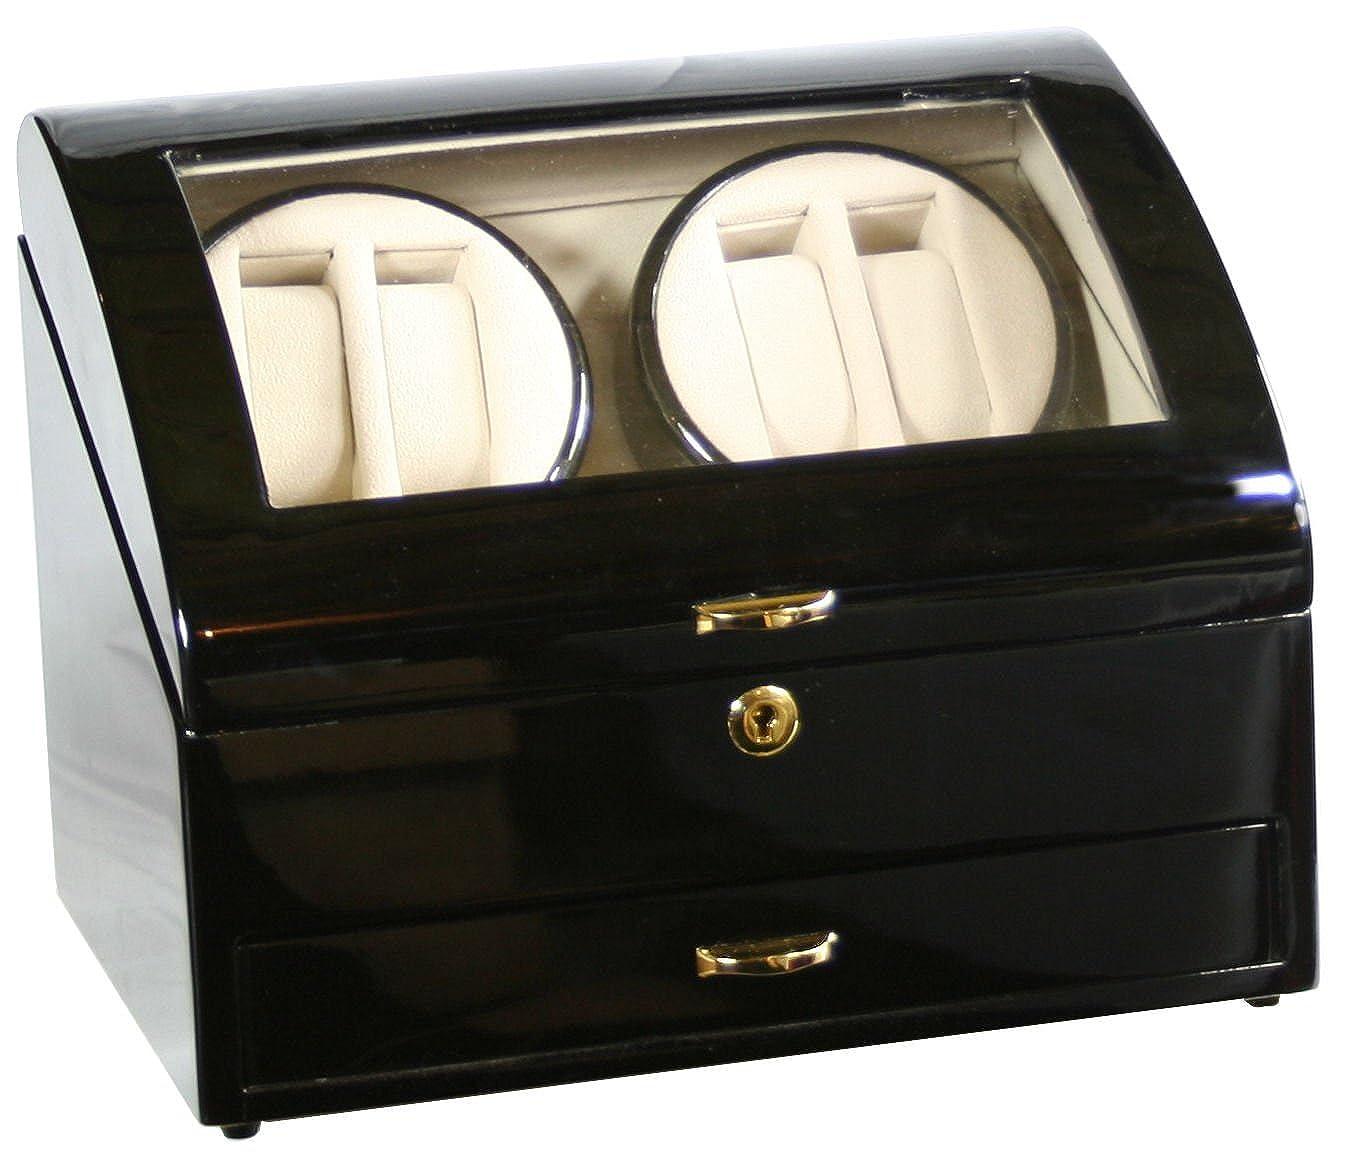 Kendal ブラックウッド製4個用ウォッチワインダー 4+6個用保管ボックス ケース (インポート) B001HPN69O